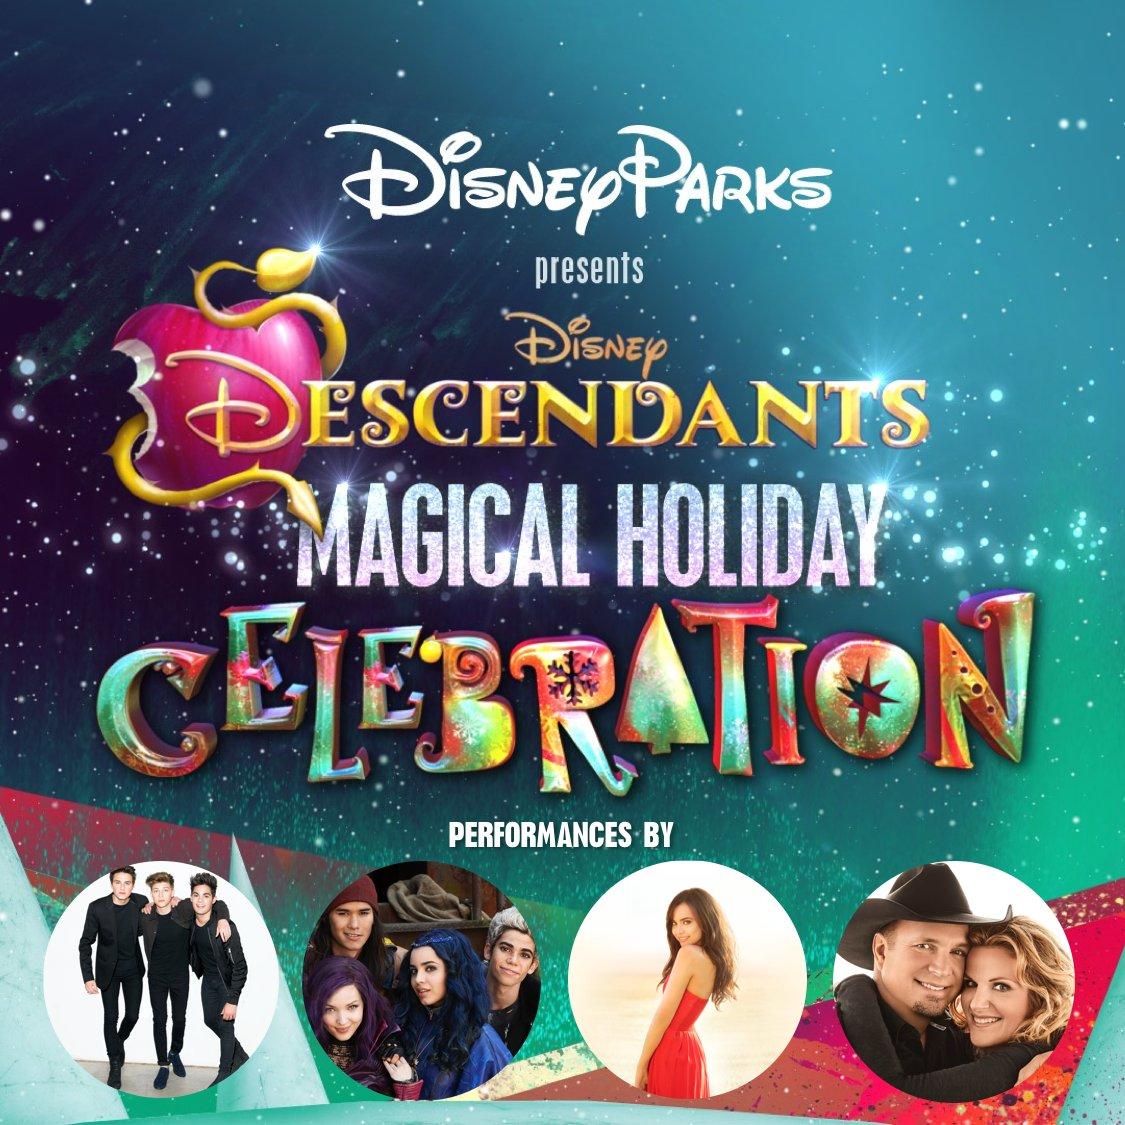 cwrsvvzviaafqn0 - Disney Channel Christmas